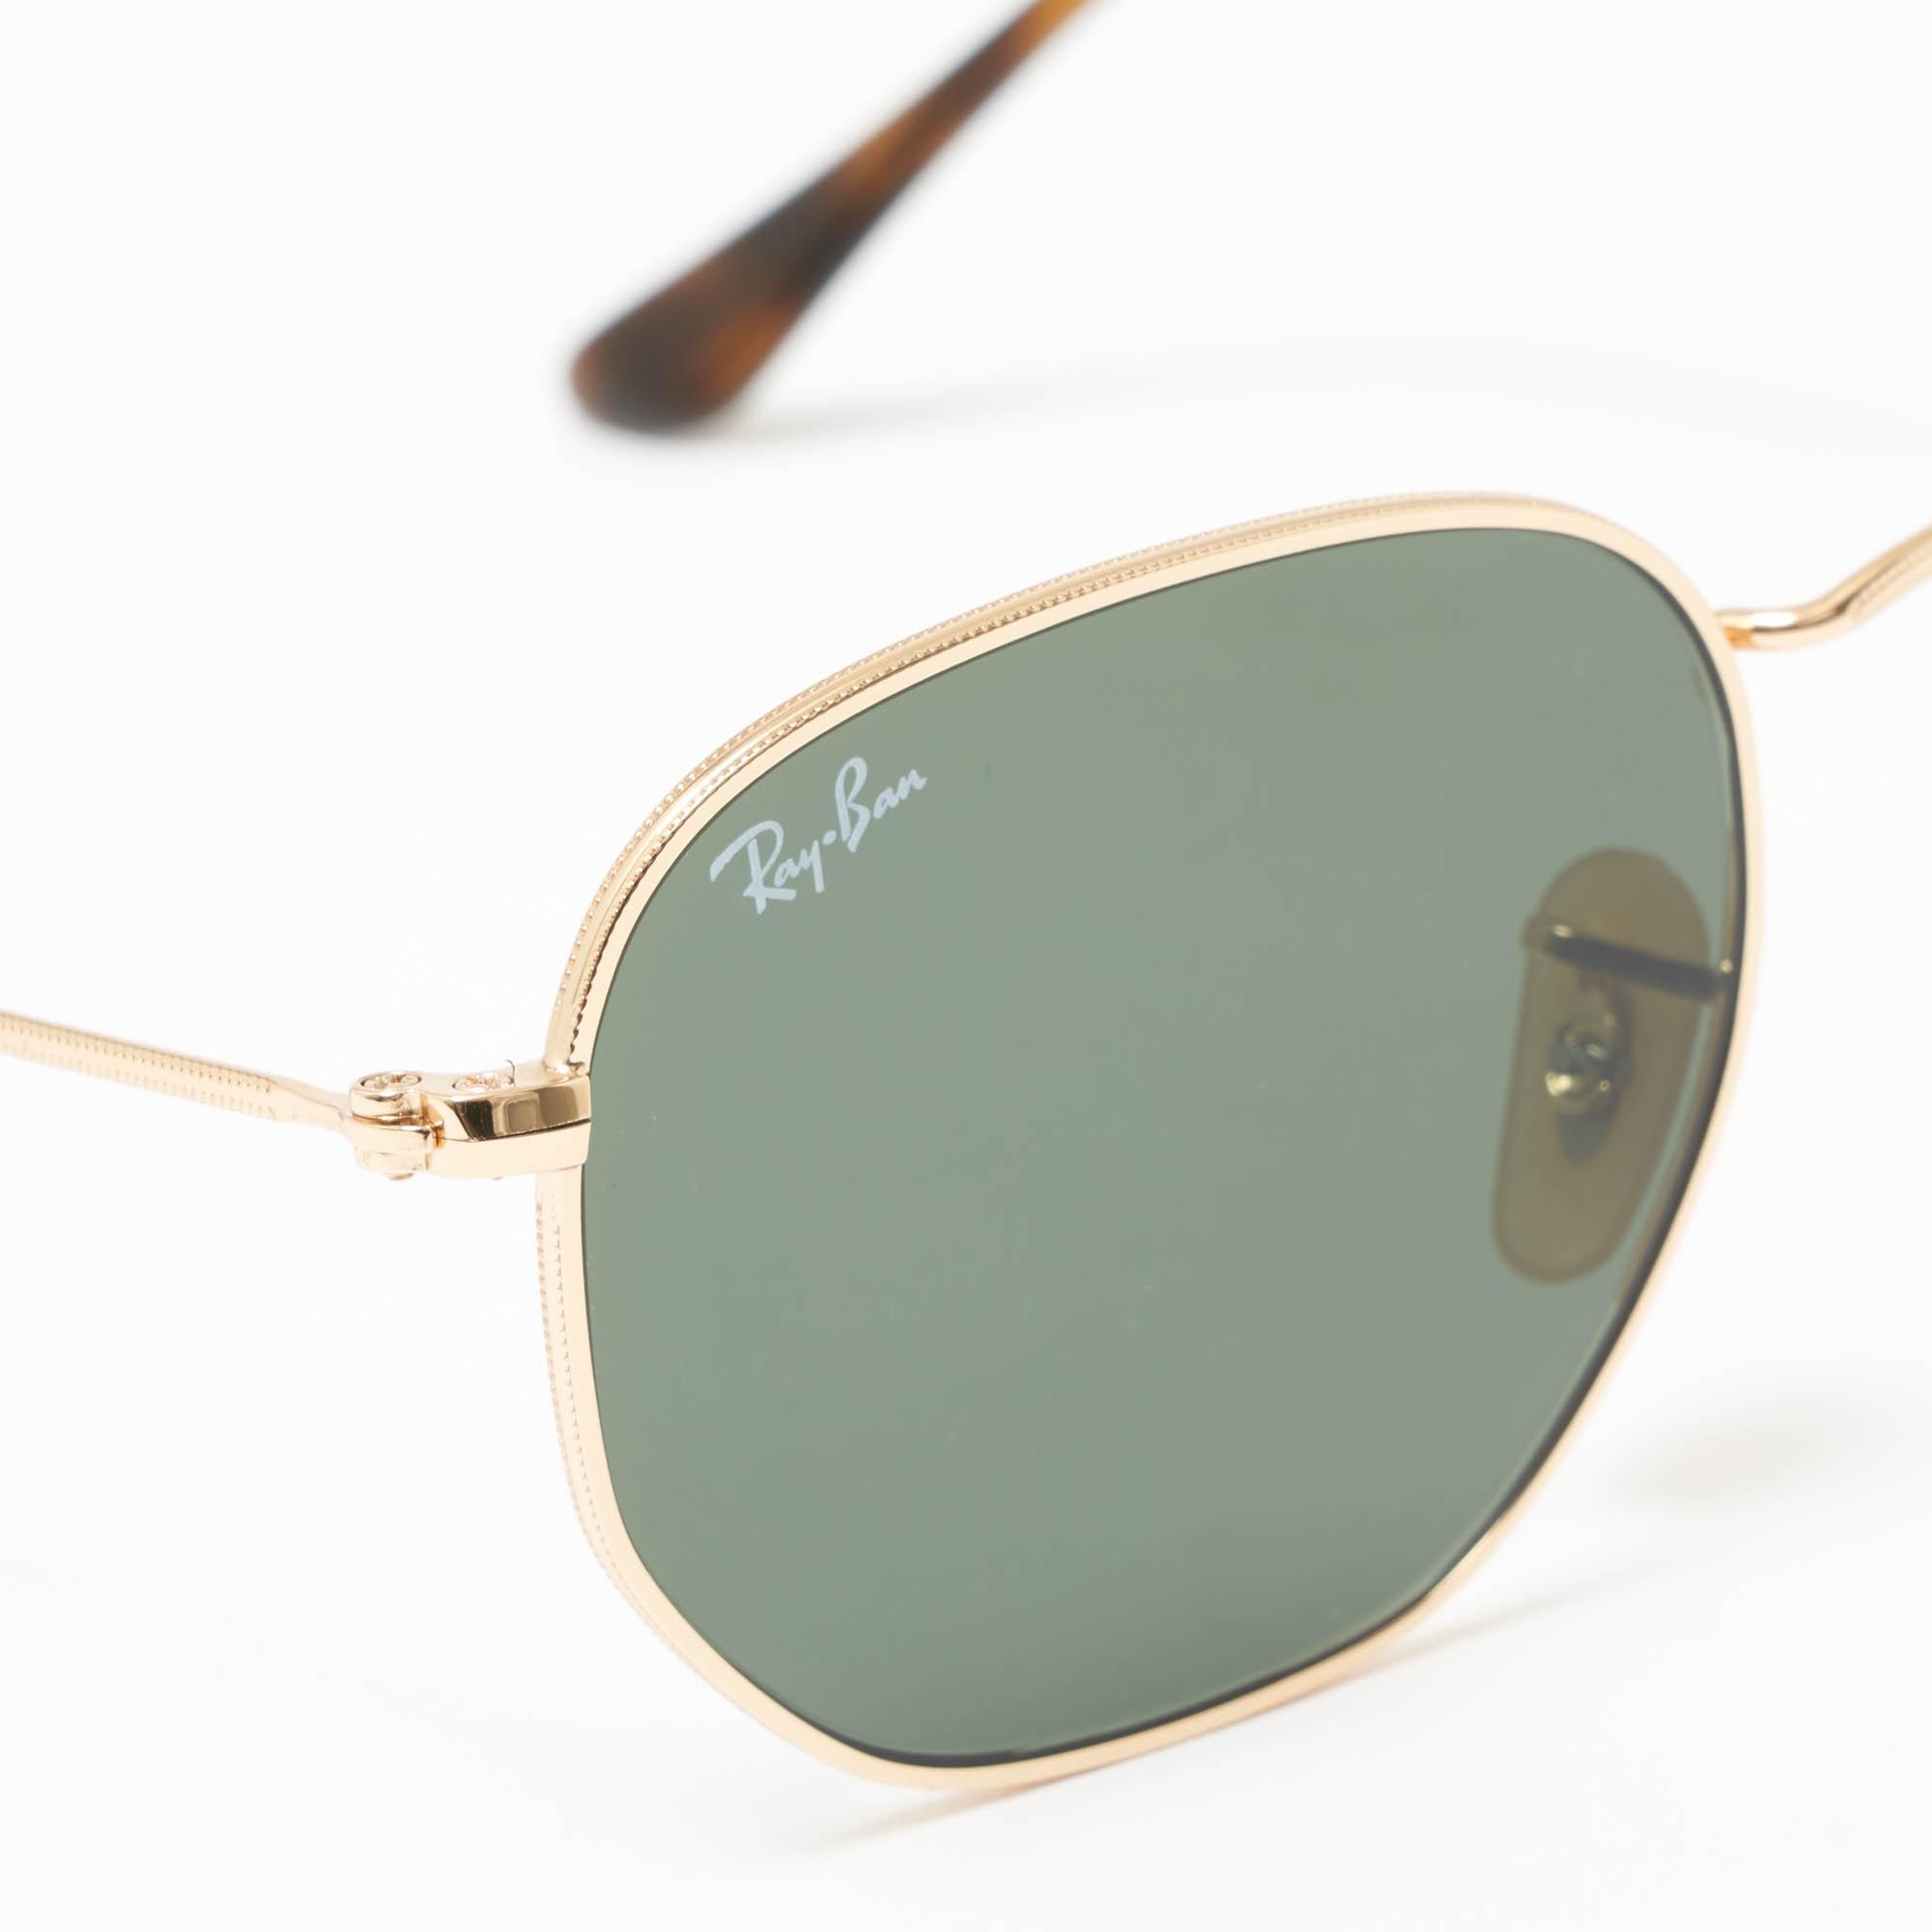 5eeaf98bb6 Ray-Ban - Metallic Gold Hexagonal Flat Lens Sunglasses - Green Classic  G-15. View fullscreen